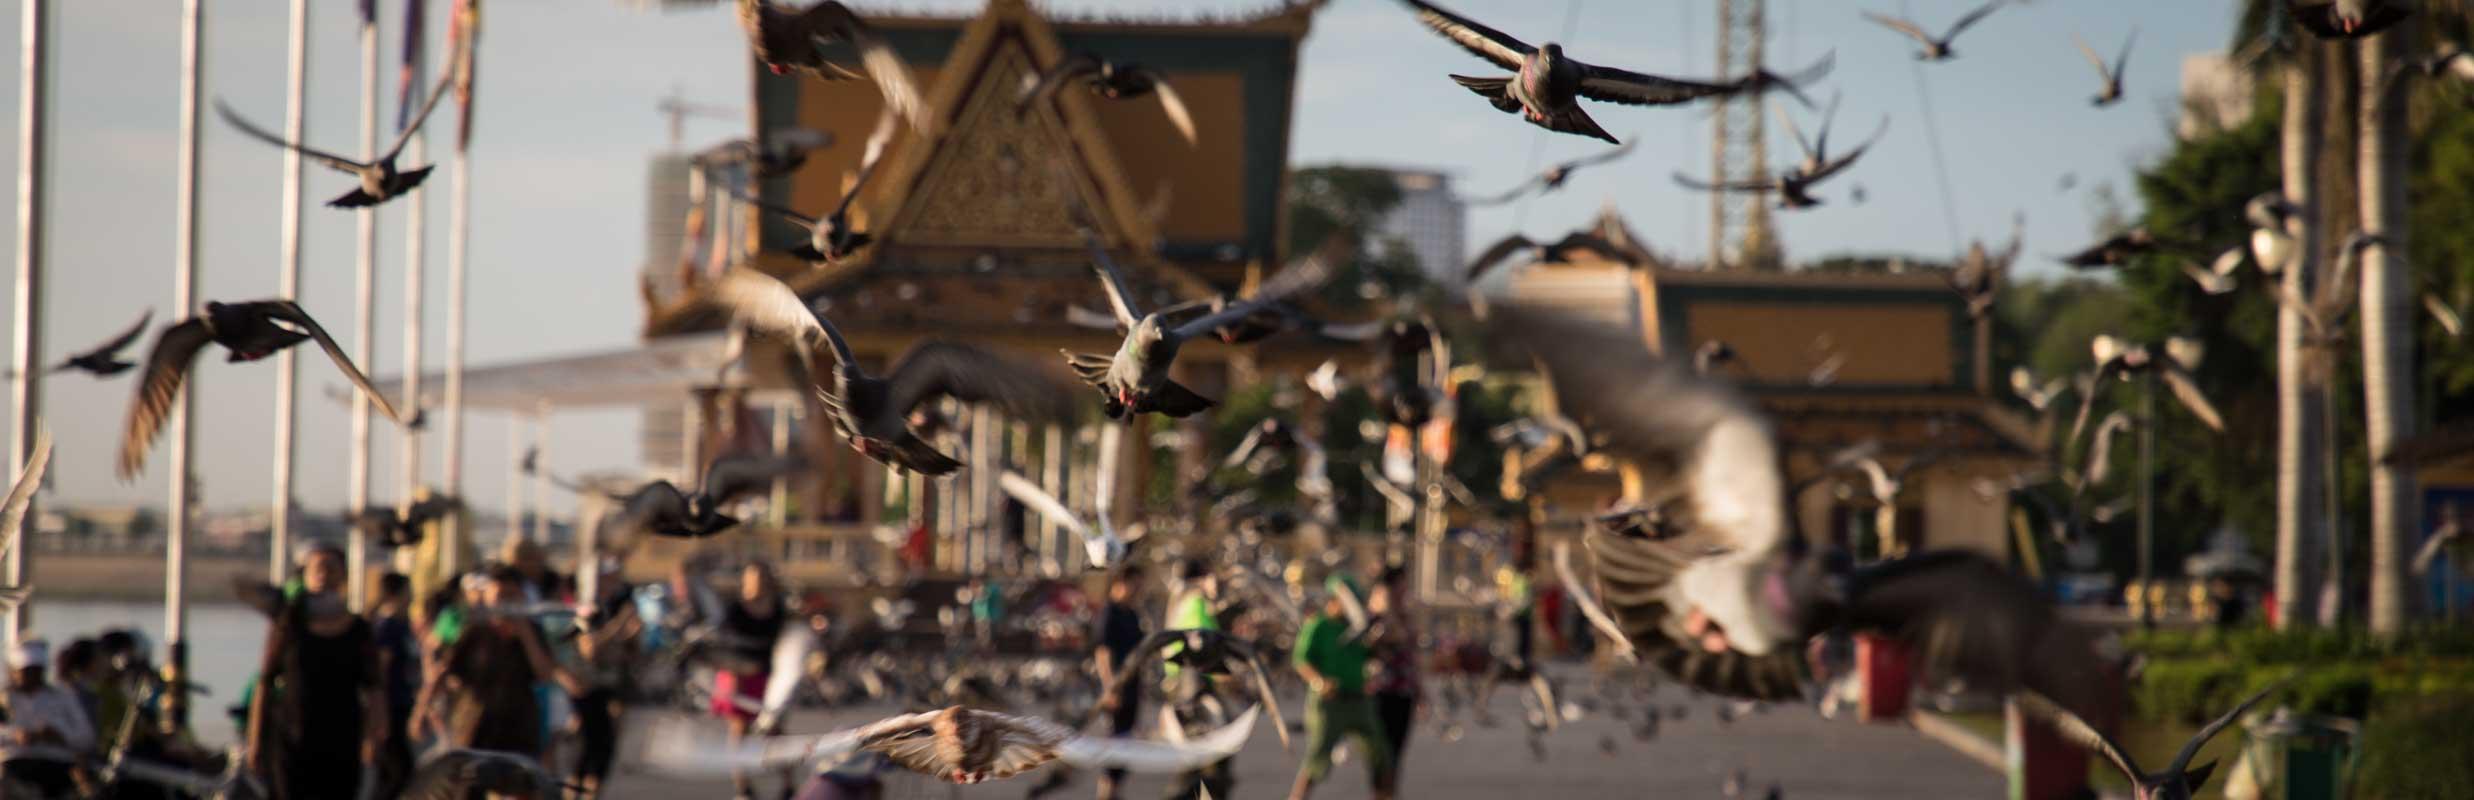 柬埔寨鸽子